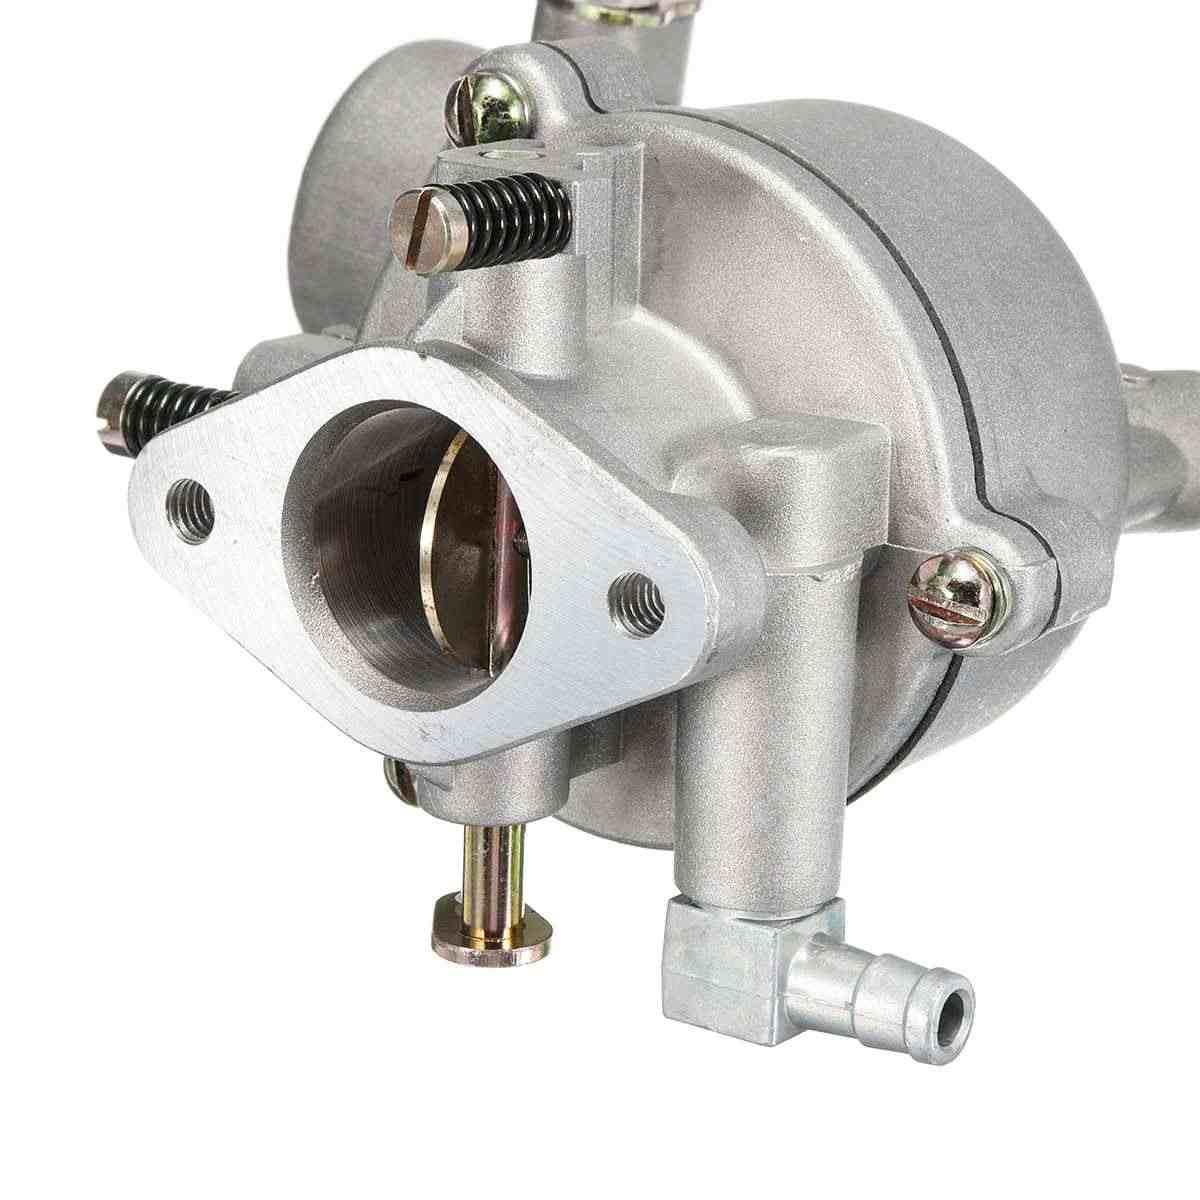 Carburetor Gasket for Coleman Powermate 3250 4000 Watt Briggs And Stratton  8HP Generator Fuel Supply Carburetor